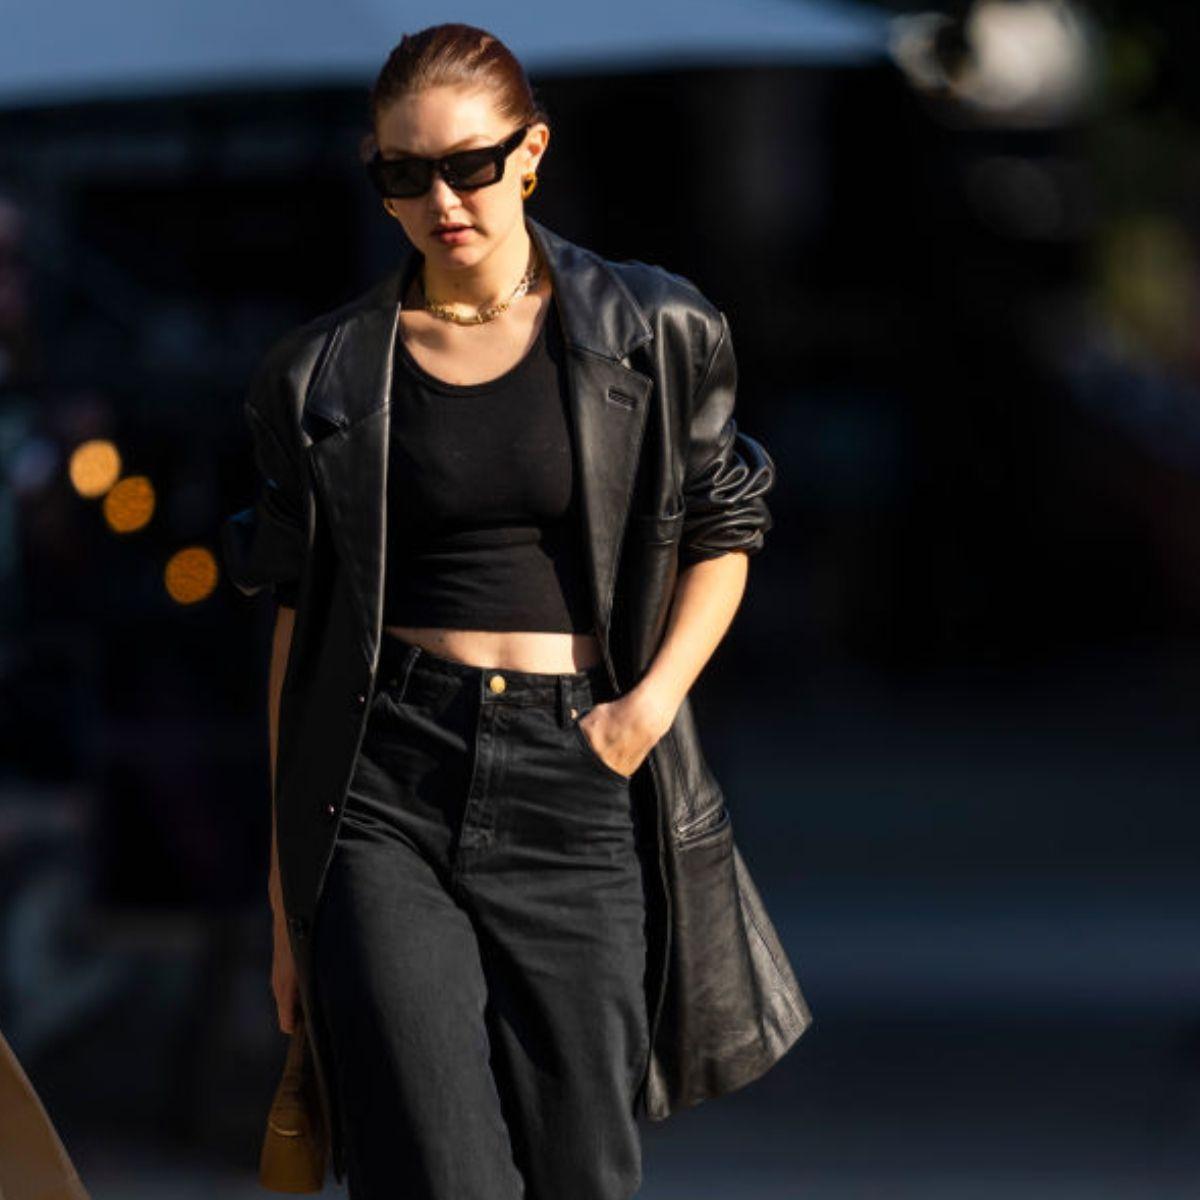 H Gigi Hadid μας δείχνει τα 5 αγαπημένα της πανωφόρια για αυτή τη σεζόν